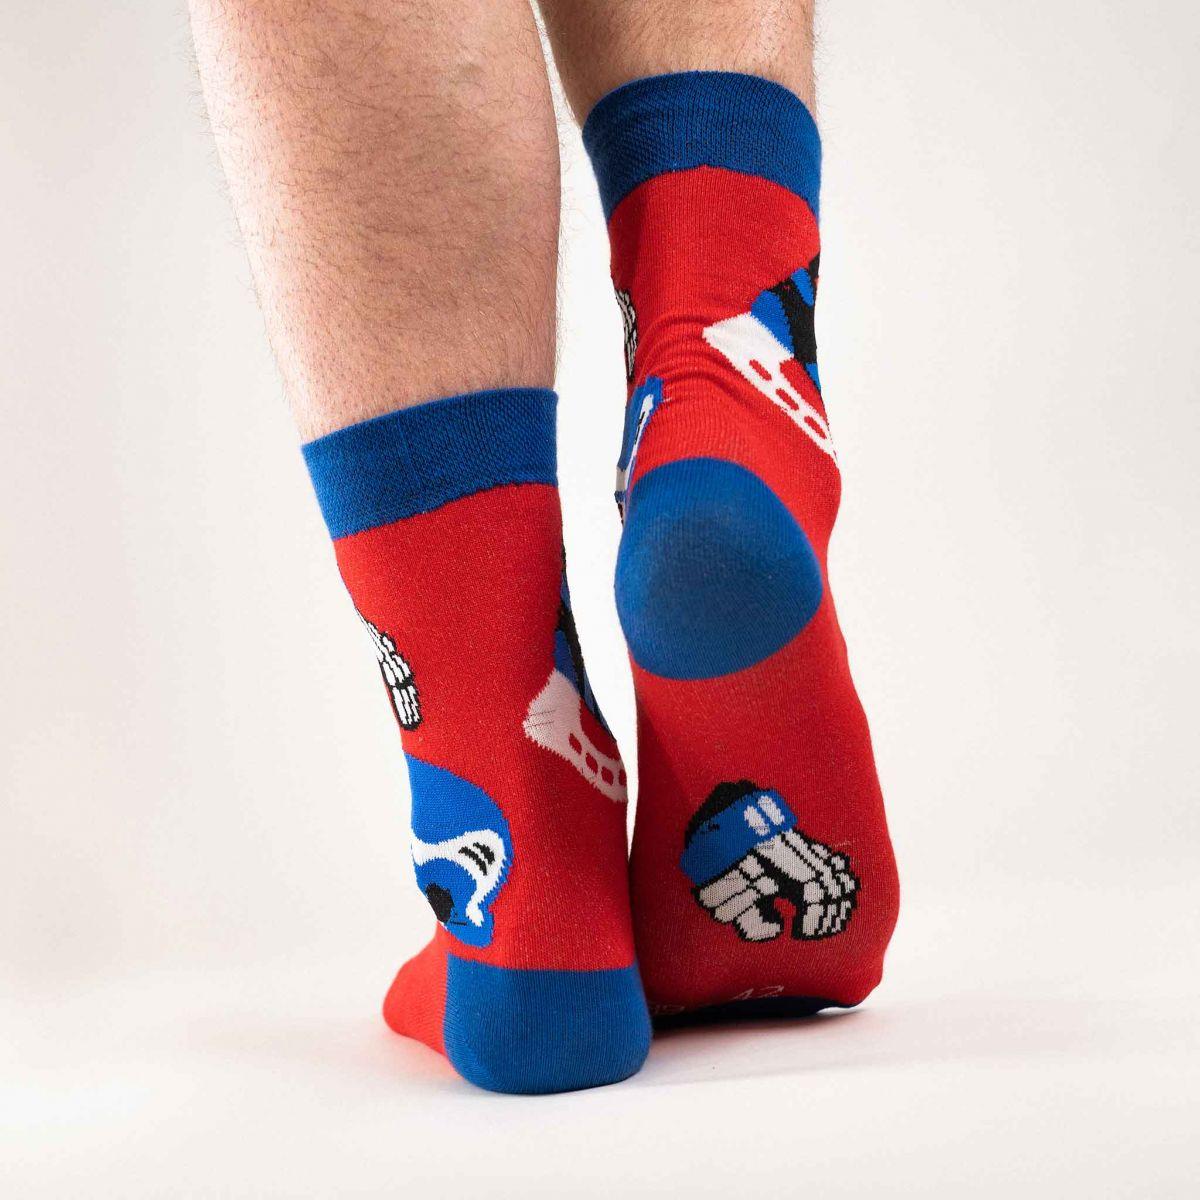 Socken - Eishockey 2 p9